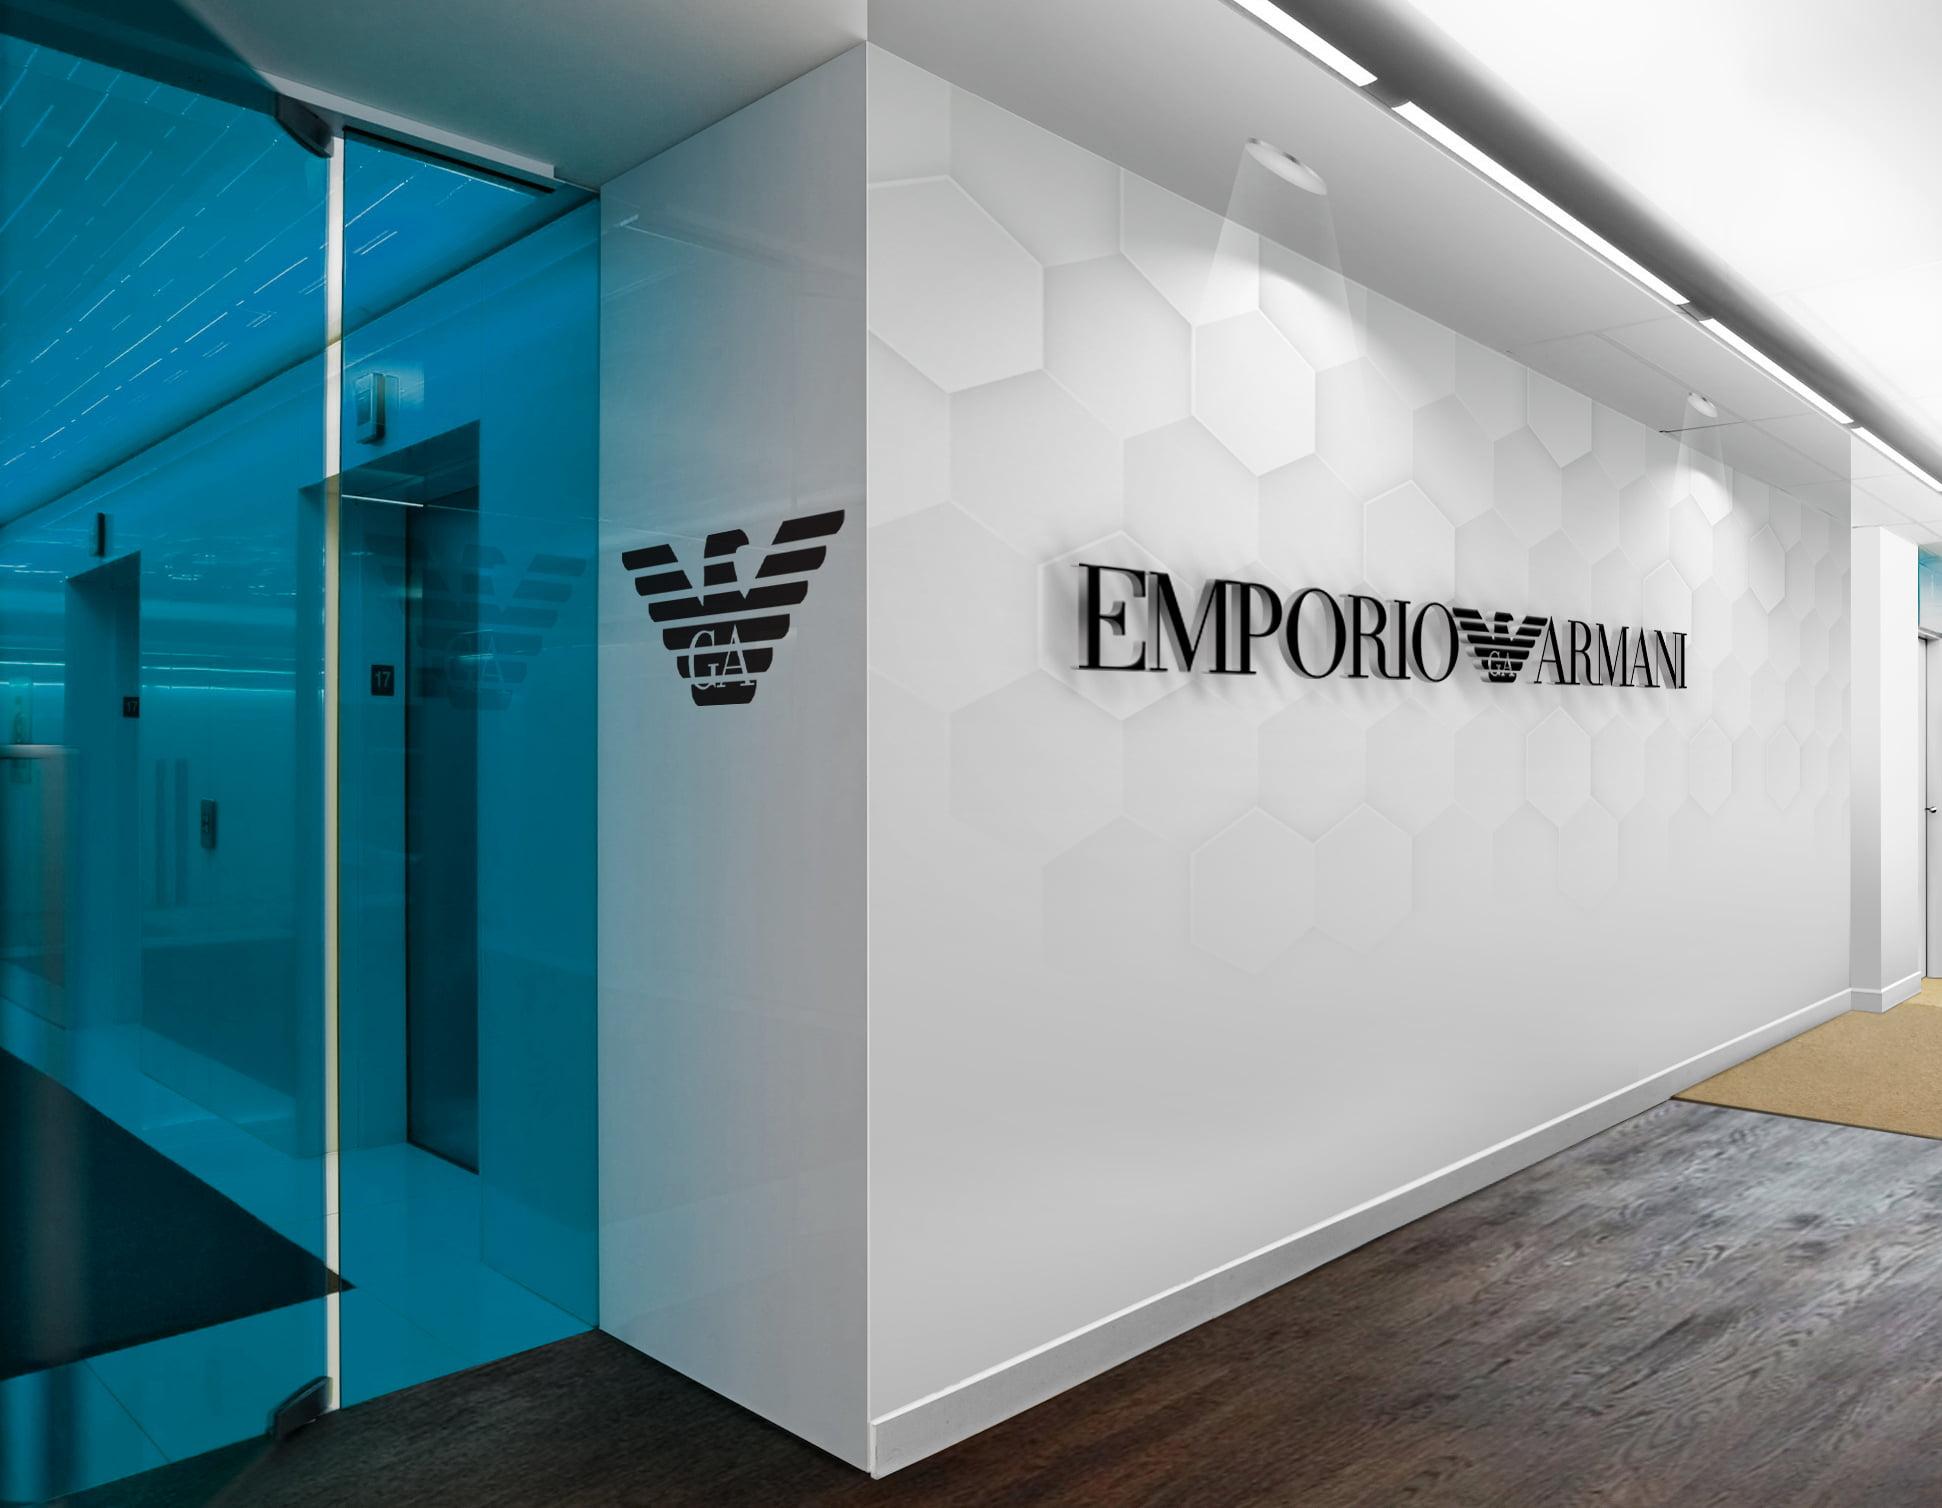 Armani-Emporio-Armani-3D-Wall-Logo-&-Slogan-Mockup